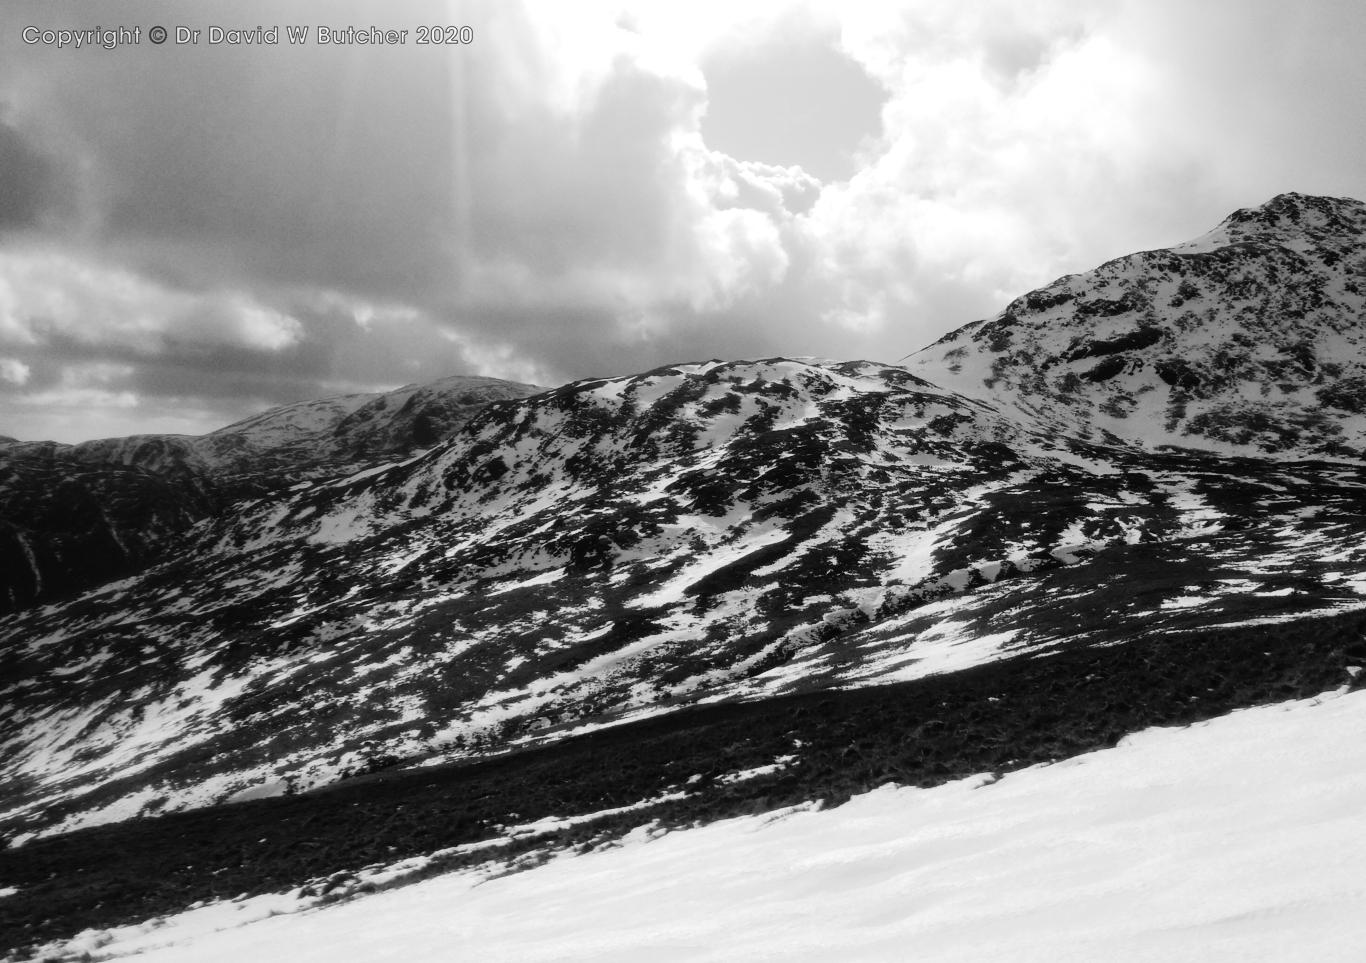 St Sunday Crag from Birks